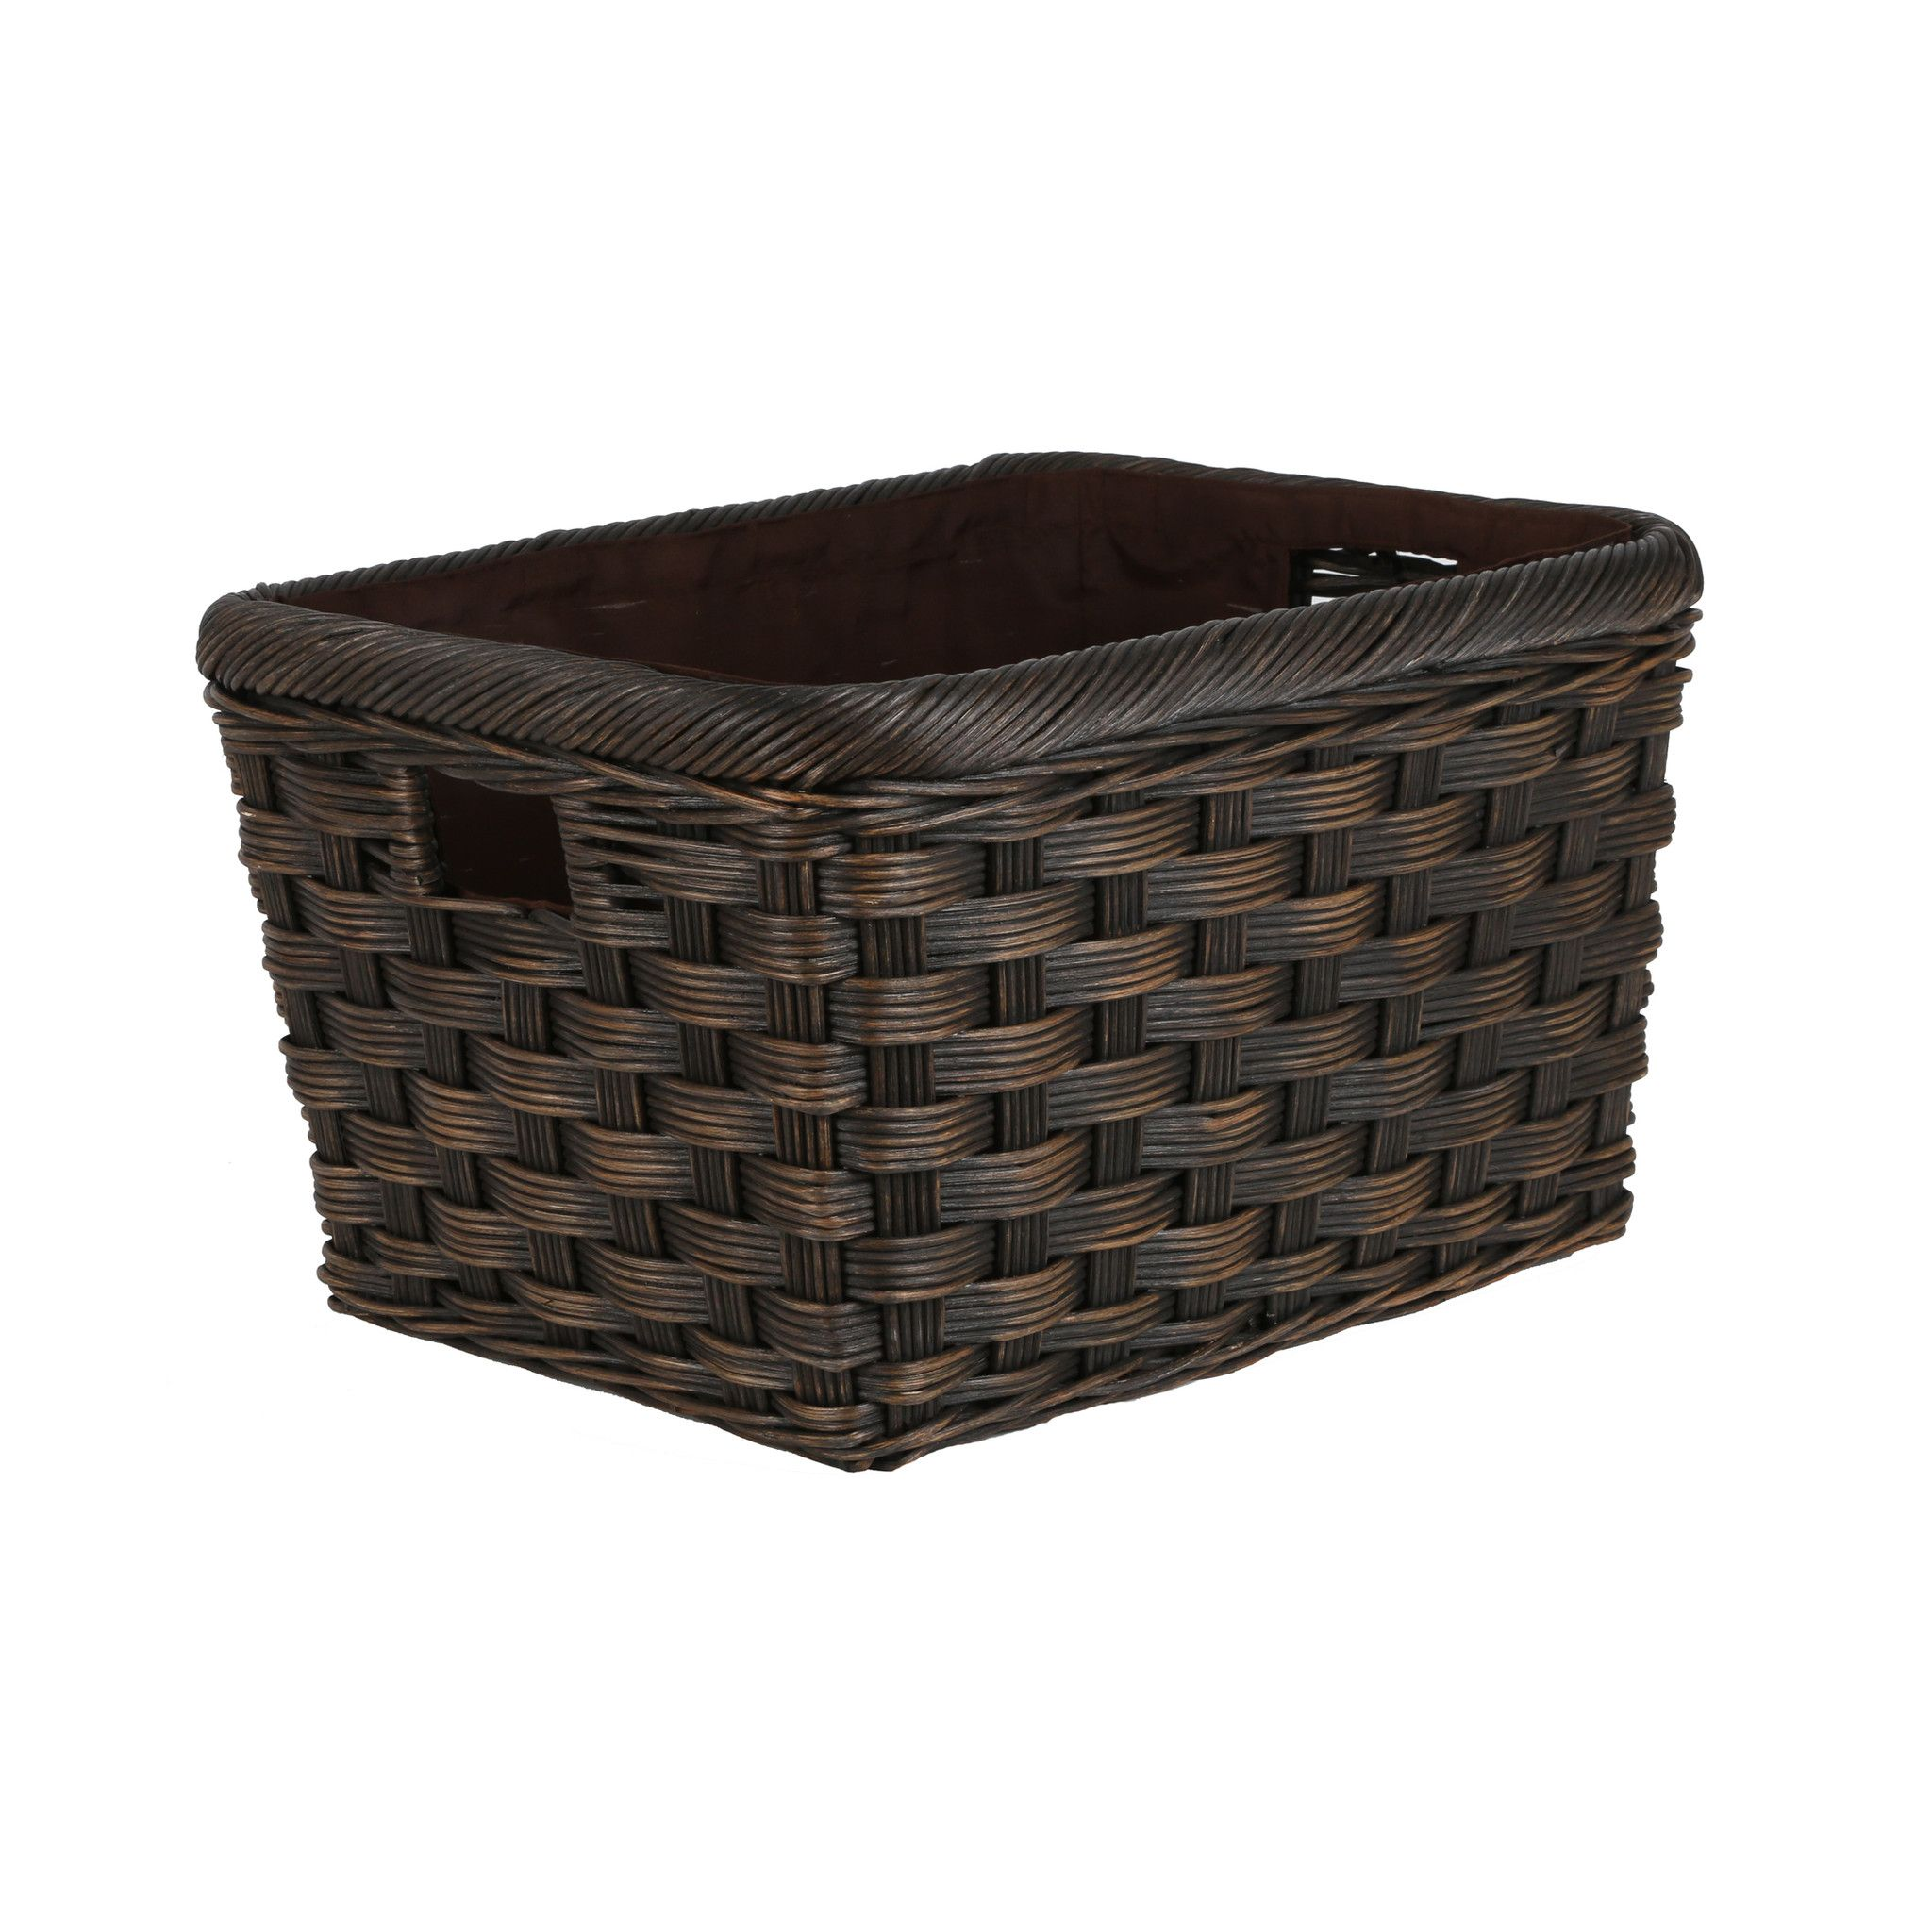 Jumbo Wicker Storage Basket in Antique Walnut Brown size M from The Basket Lady  sc 1 st  Pinterest & Jumbo Wicker Storage Basket | Pinterest | Wicker storage baskets ...